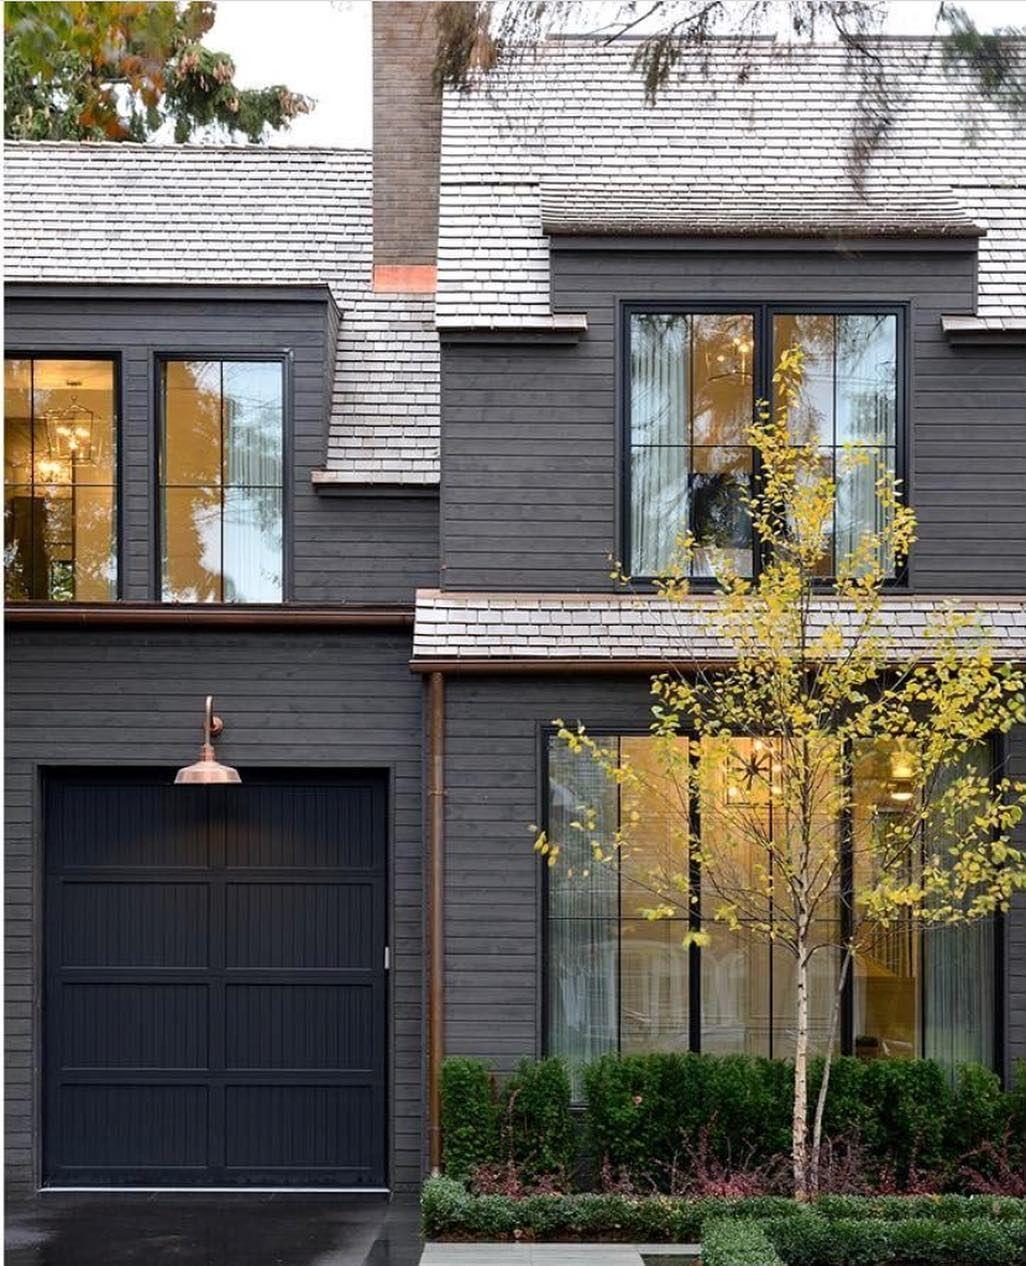 Black charcoal exterior facade garage door and windows - Modern exterior house colors ...